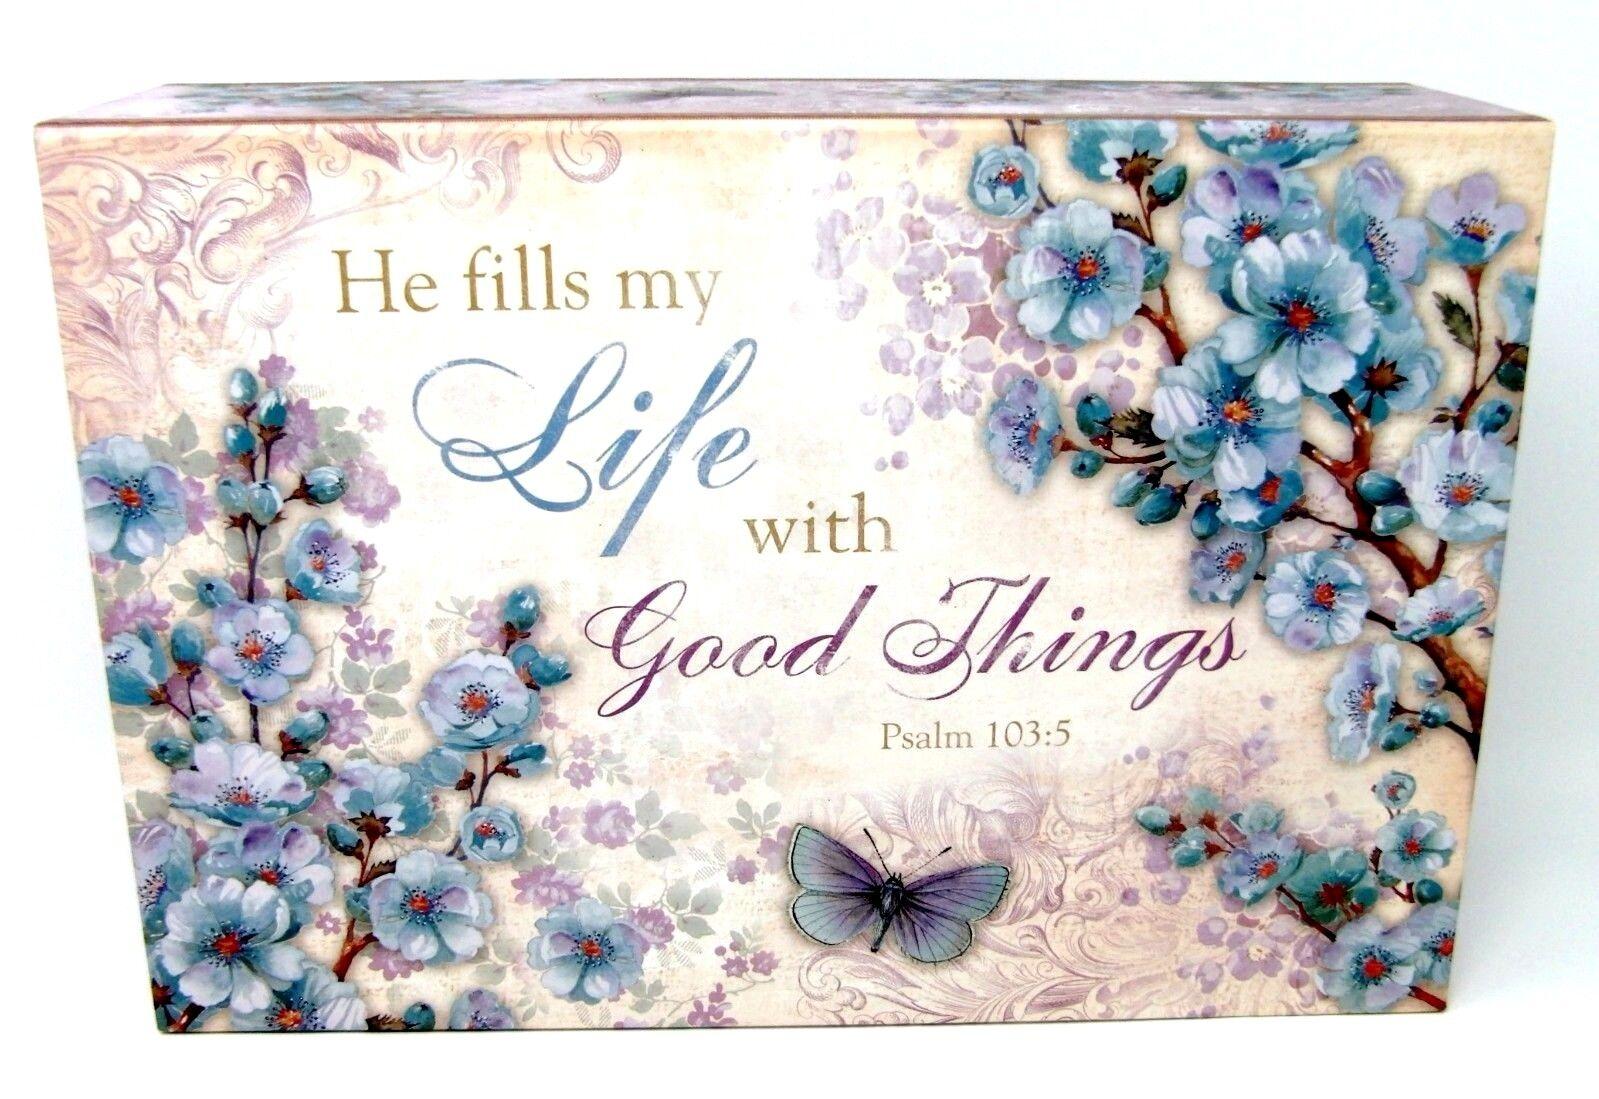 Pooch & Sweetheart Flip Top Nesting Box Floral Scripture 97481 Med Punch Studio